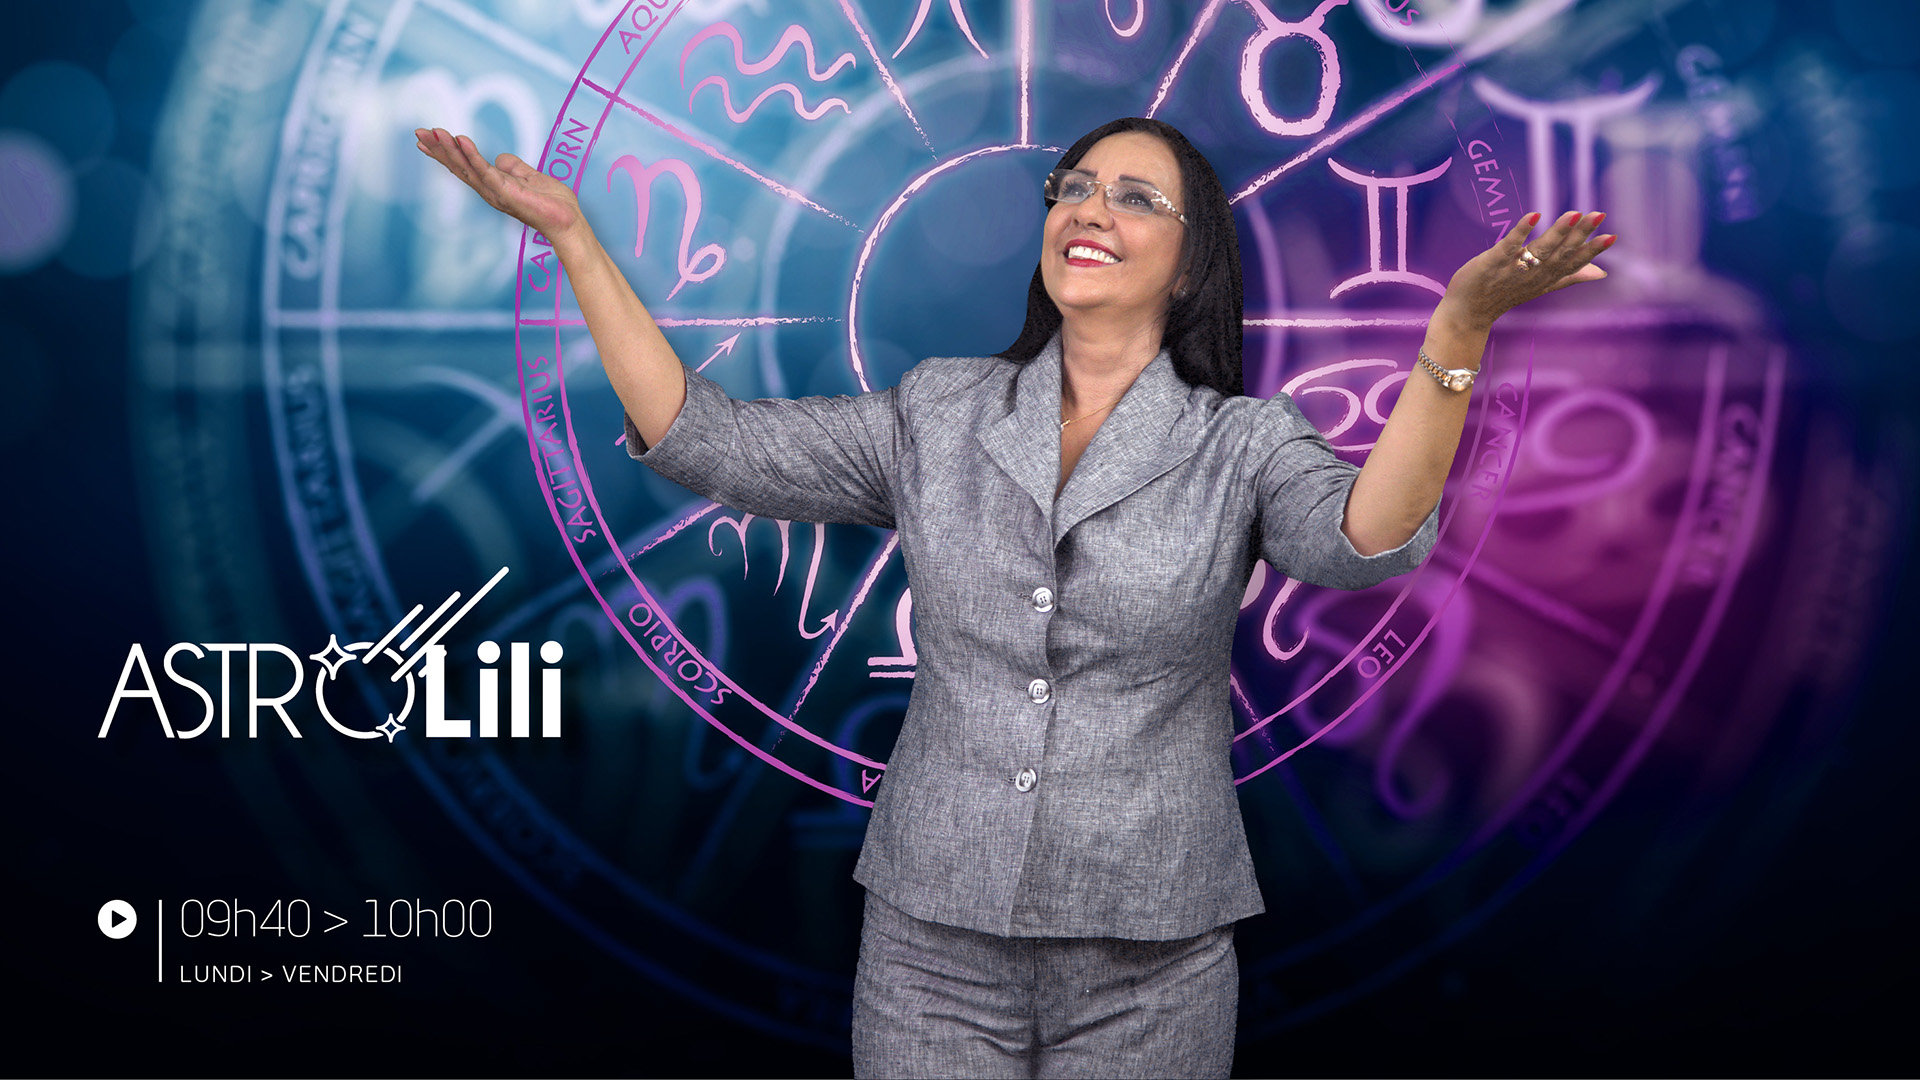 Astro Lili du jeudi 04 Juin 2020